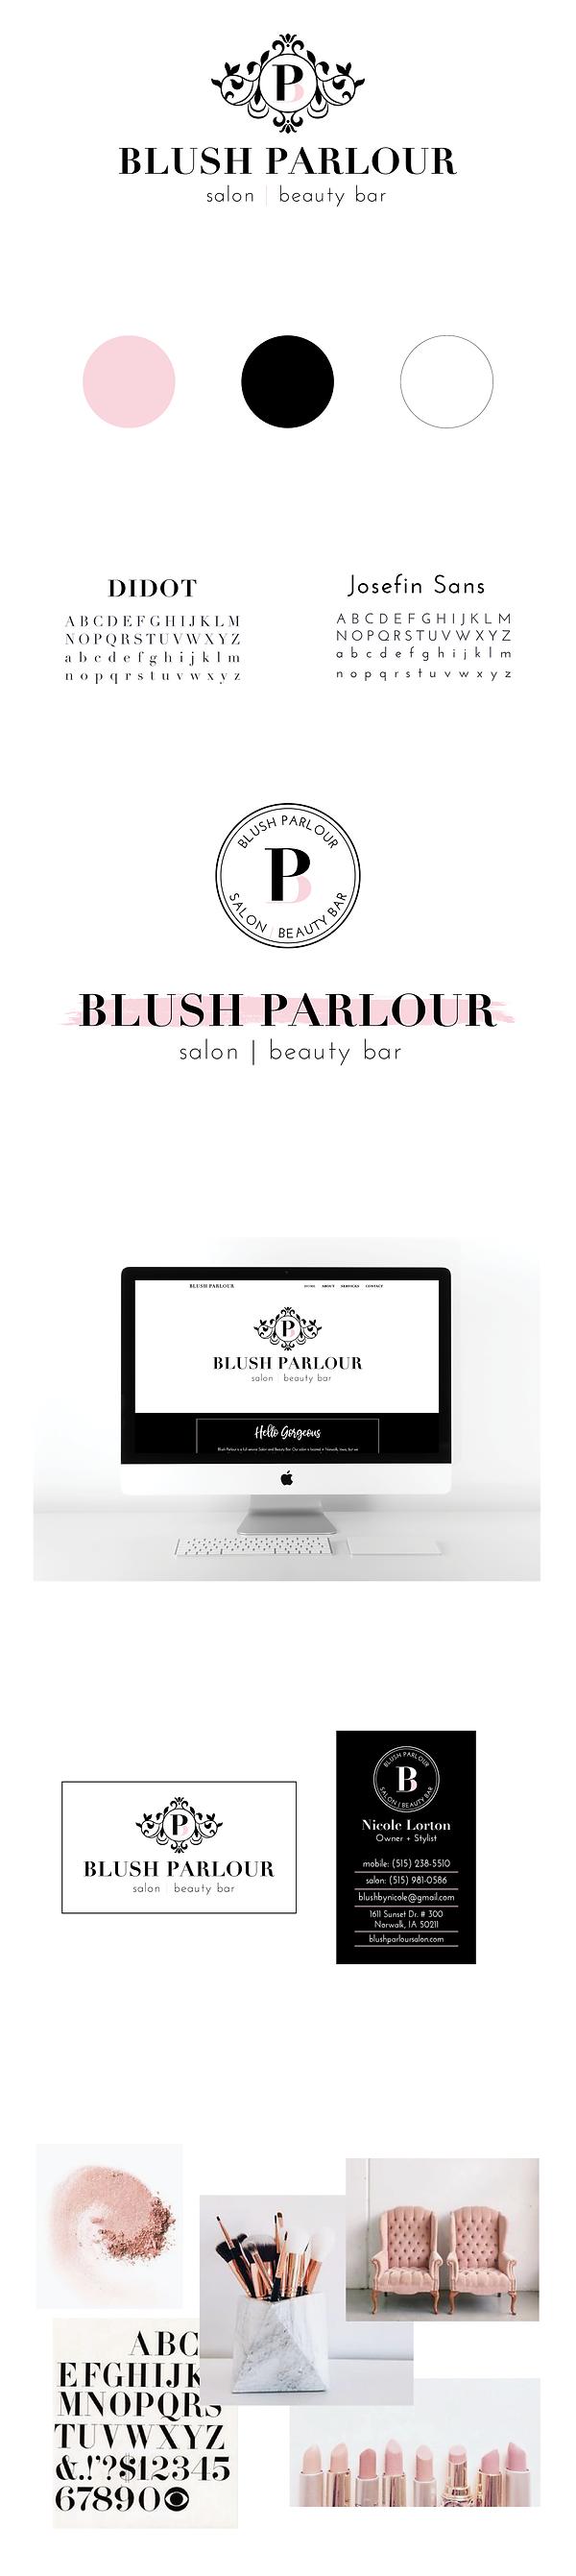 BDC_Website_FeaturedProject_BlushParlour